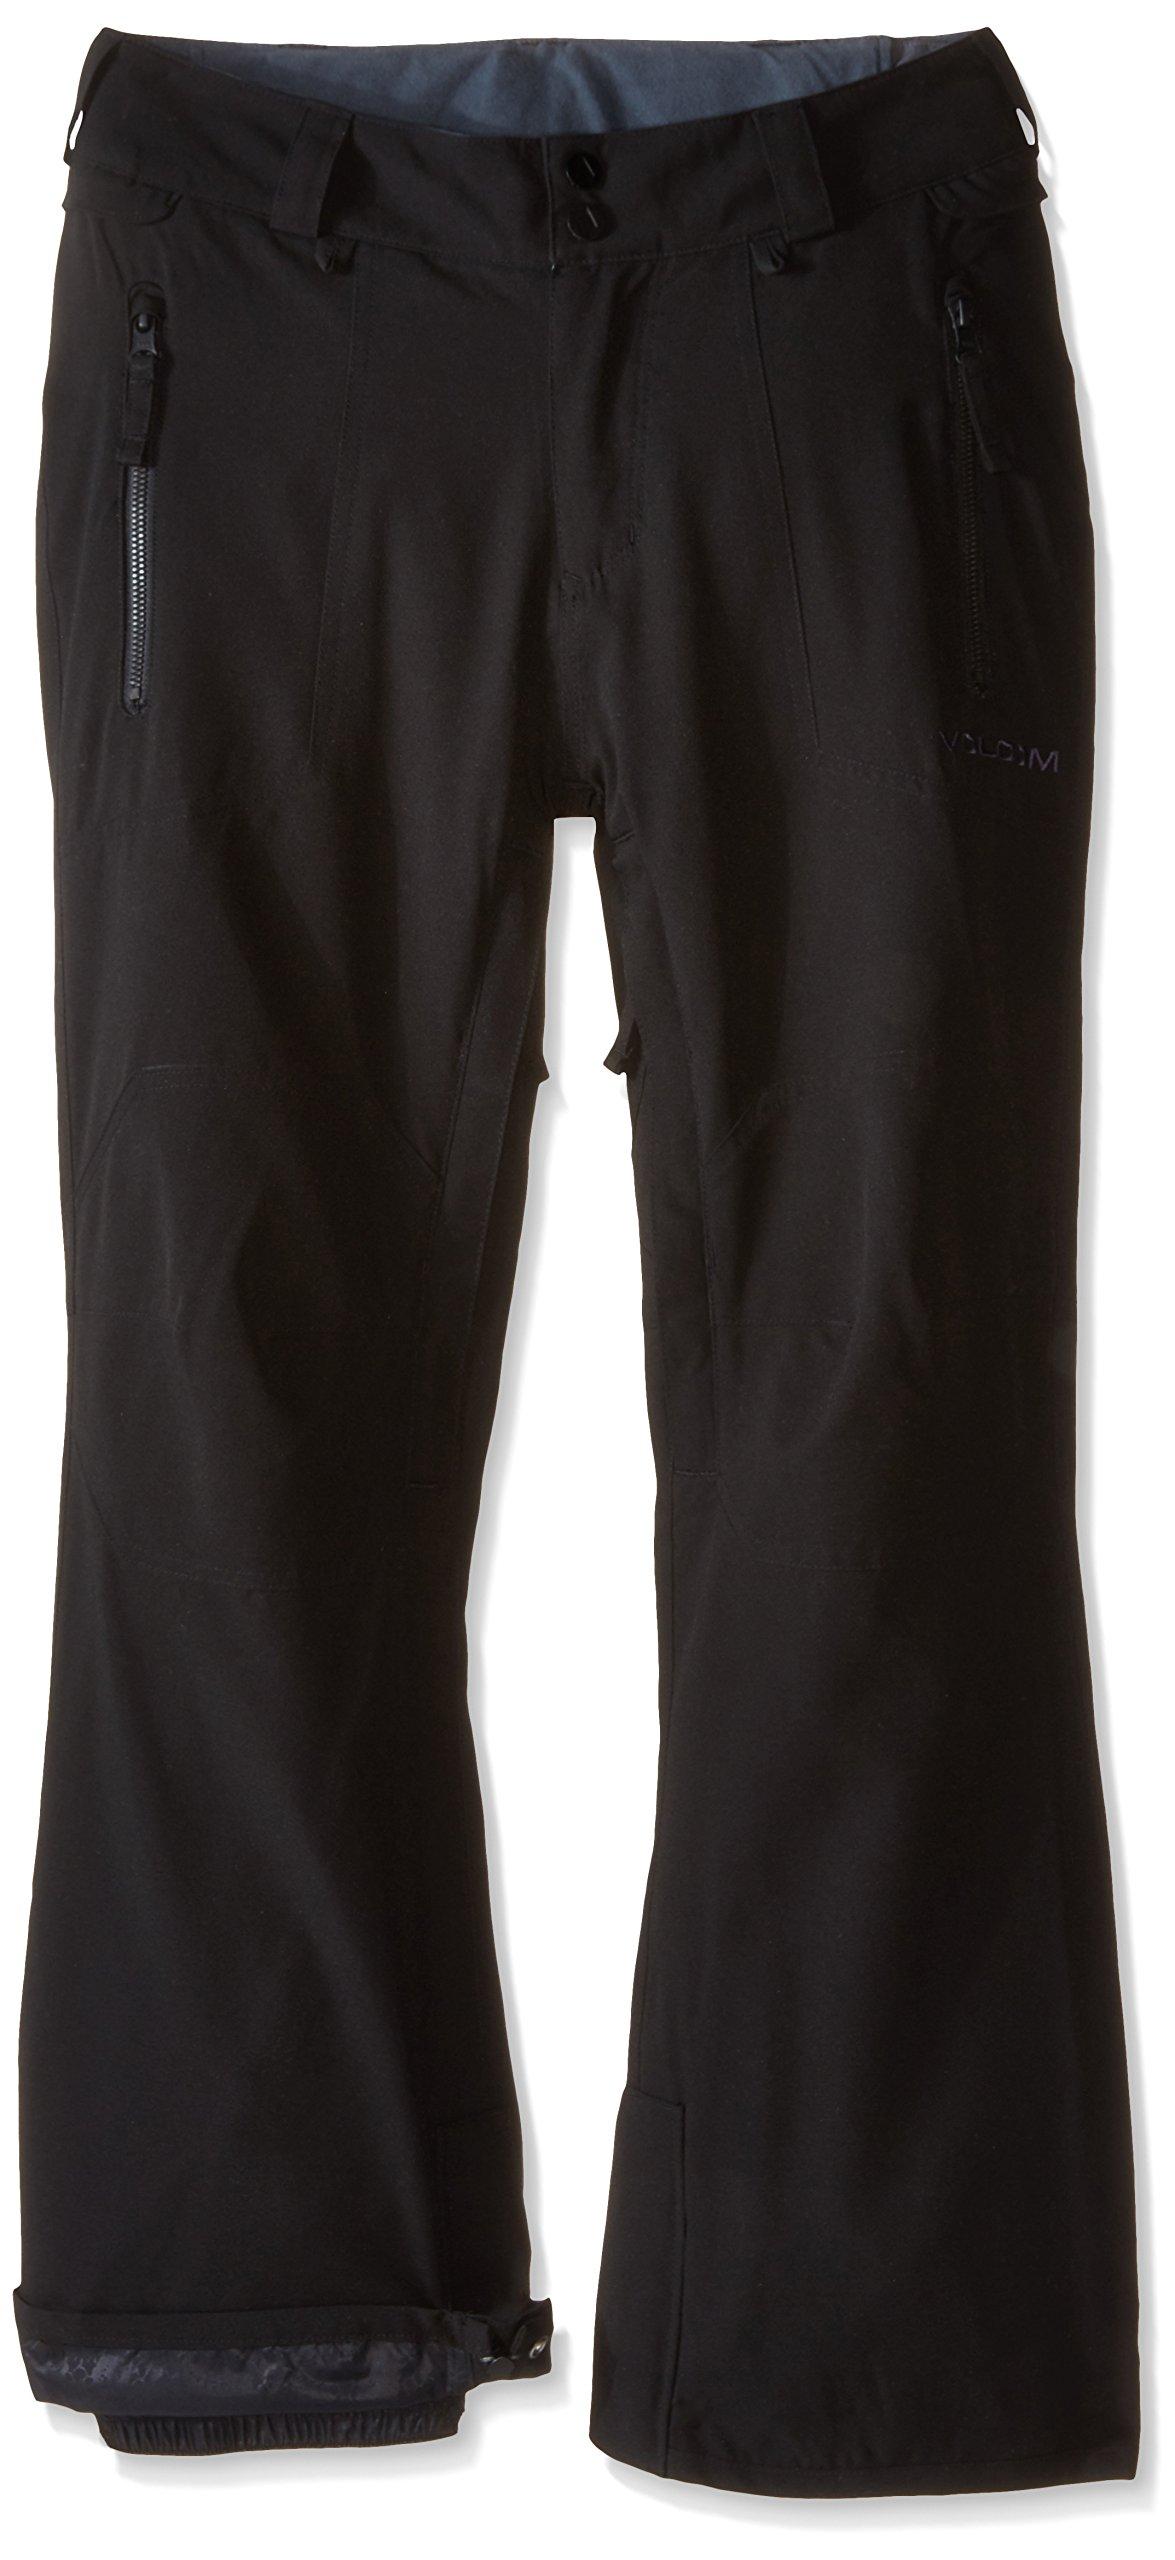 Volcom Big Boys' Datura Pant, Black, Large by Volcom